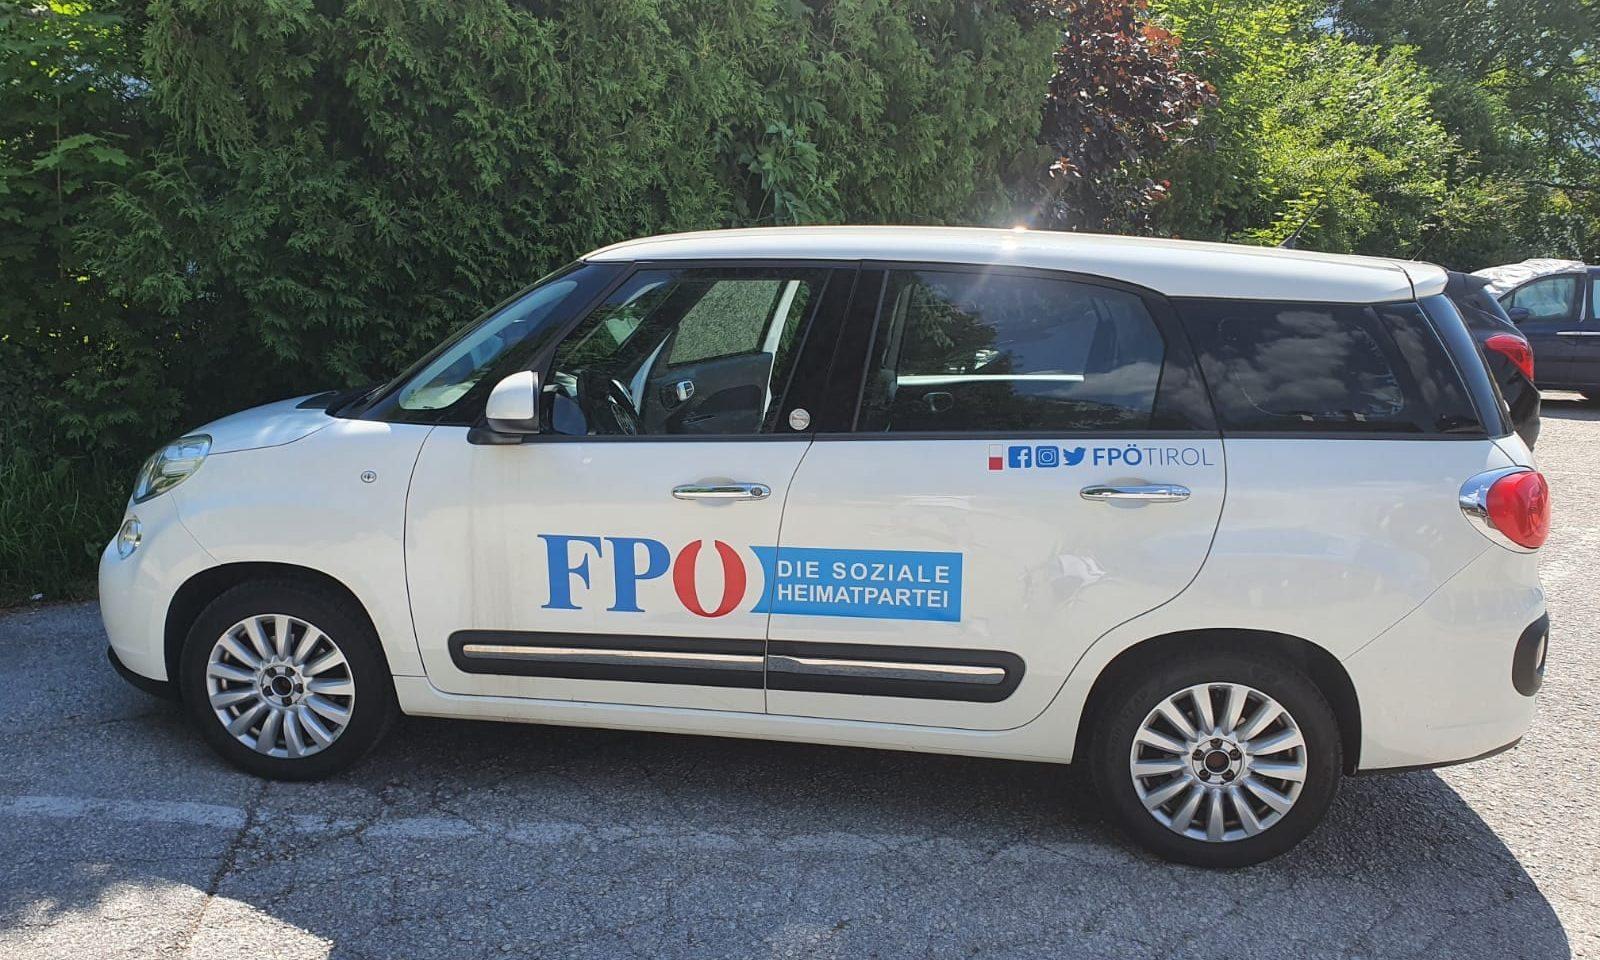 FPÖ-Auto